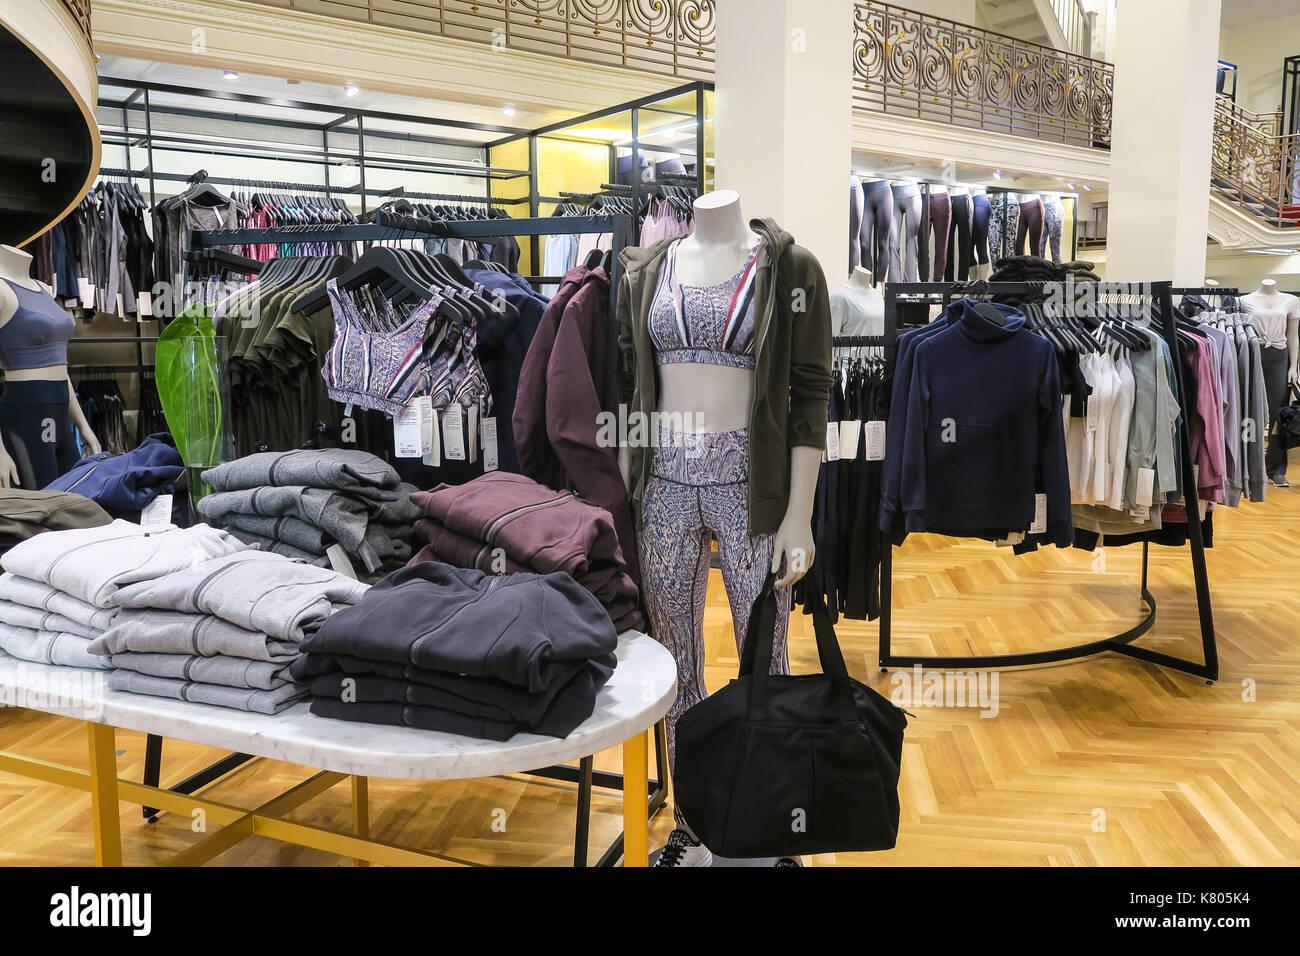 Lululemon Factory Outlet Store Online, Cheap Lululemon Yoga Clothes